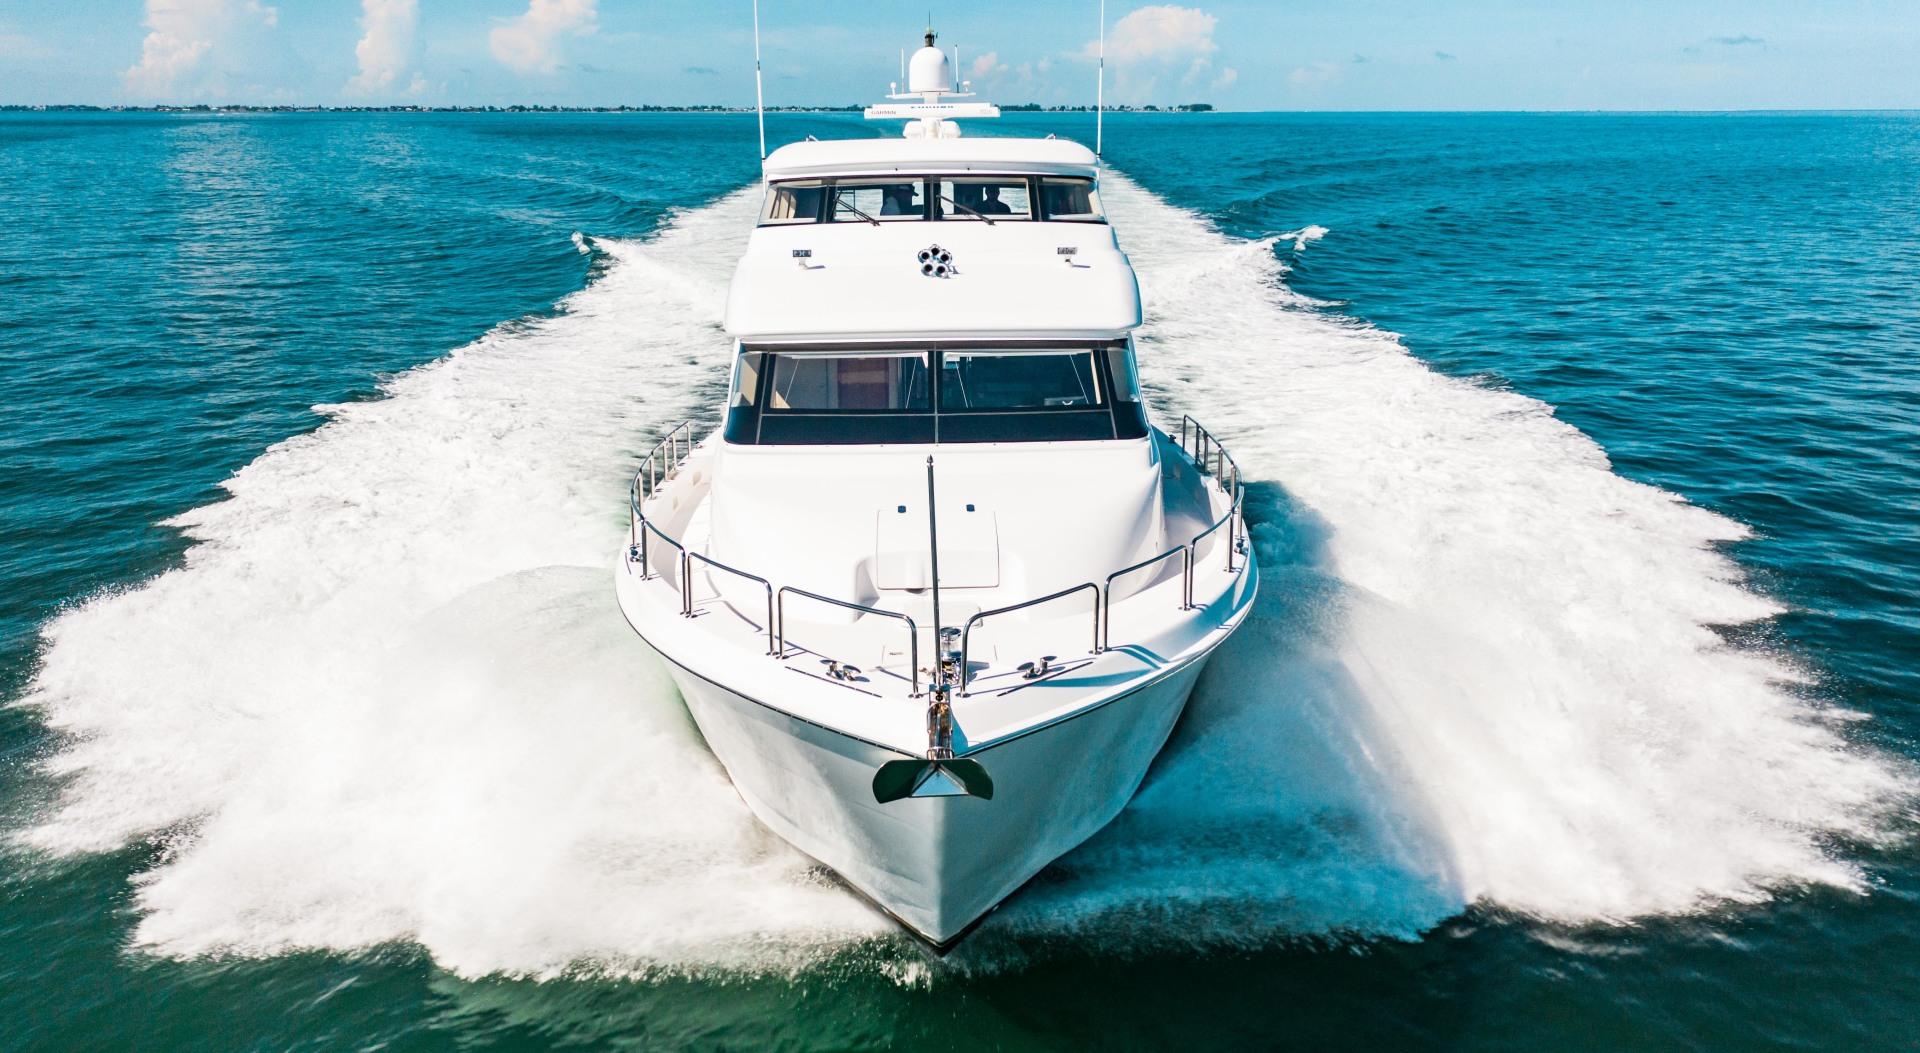 Hatteras-80 Motor Yacht 2008-Galati Yacht Sales Trade Anna Maria-Florida-United States-2008 Hatteras 80 Motor Yacht  Galati Yacht Sales Trade-1466274 | Thumbnail